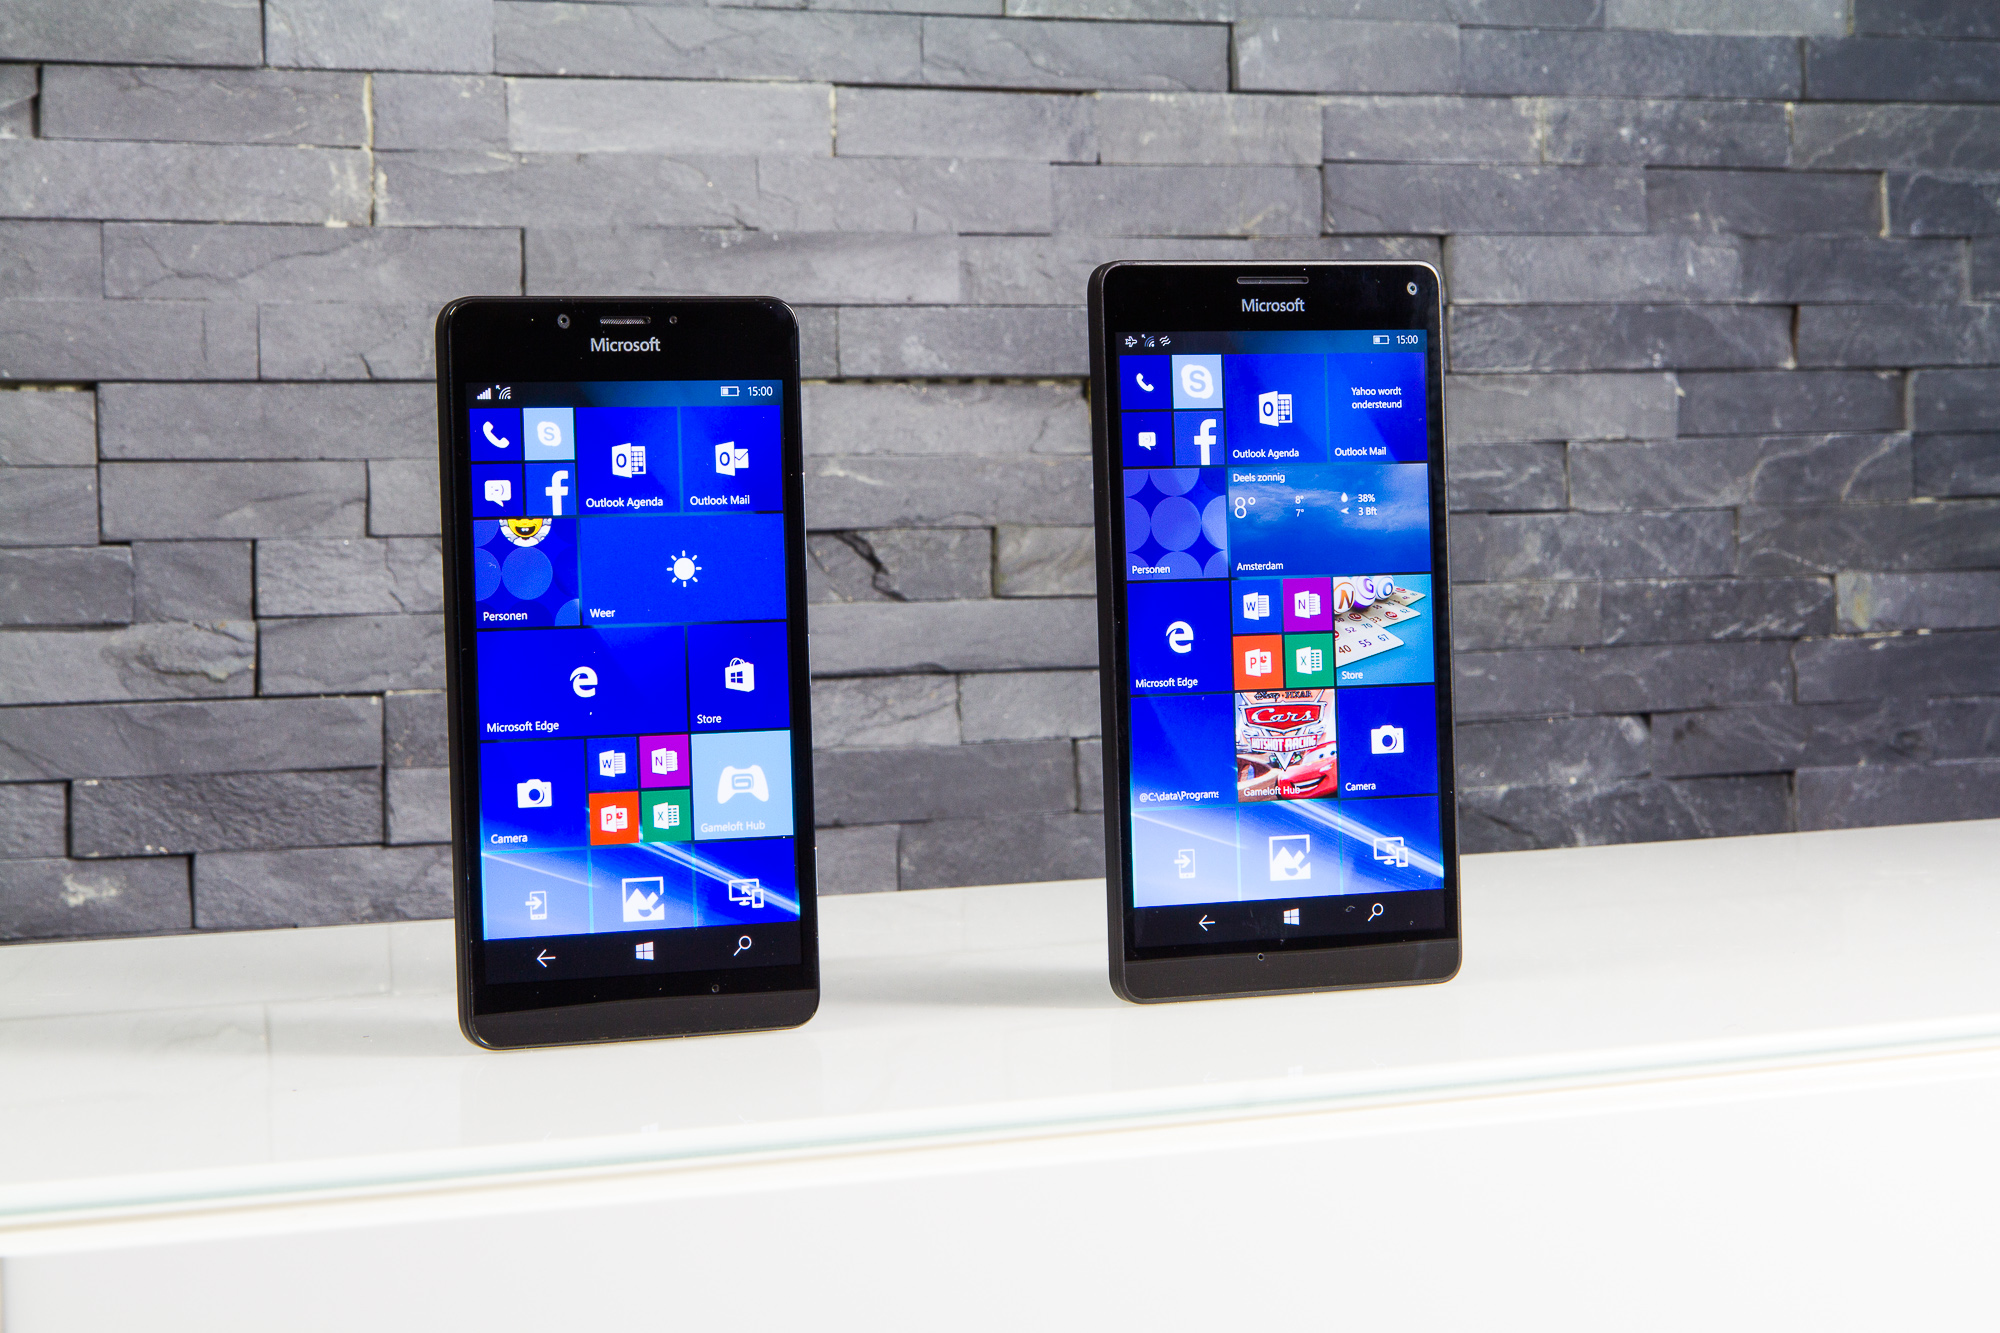 Windows 10 Mobile op de Lumia 950 en 950 XL